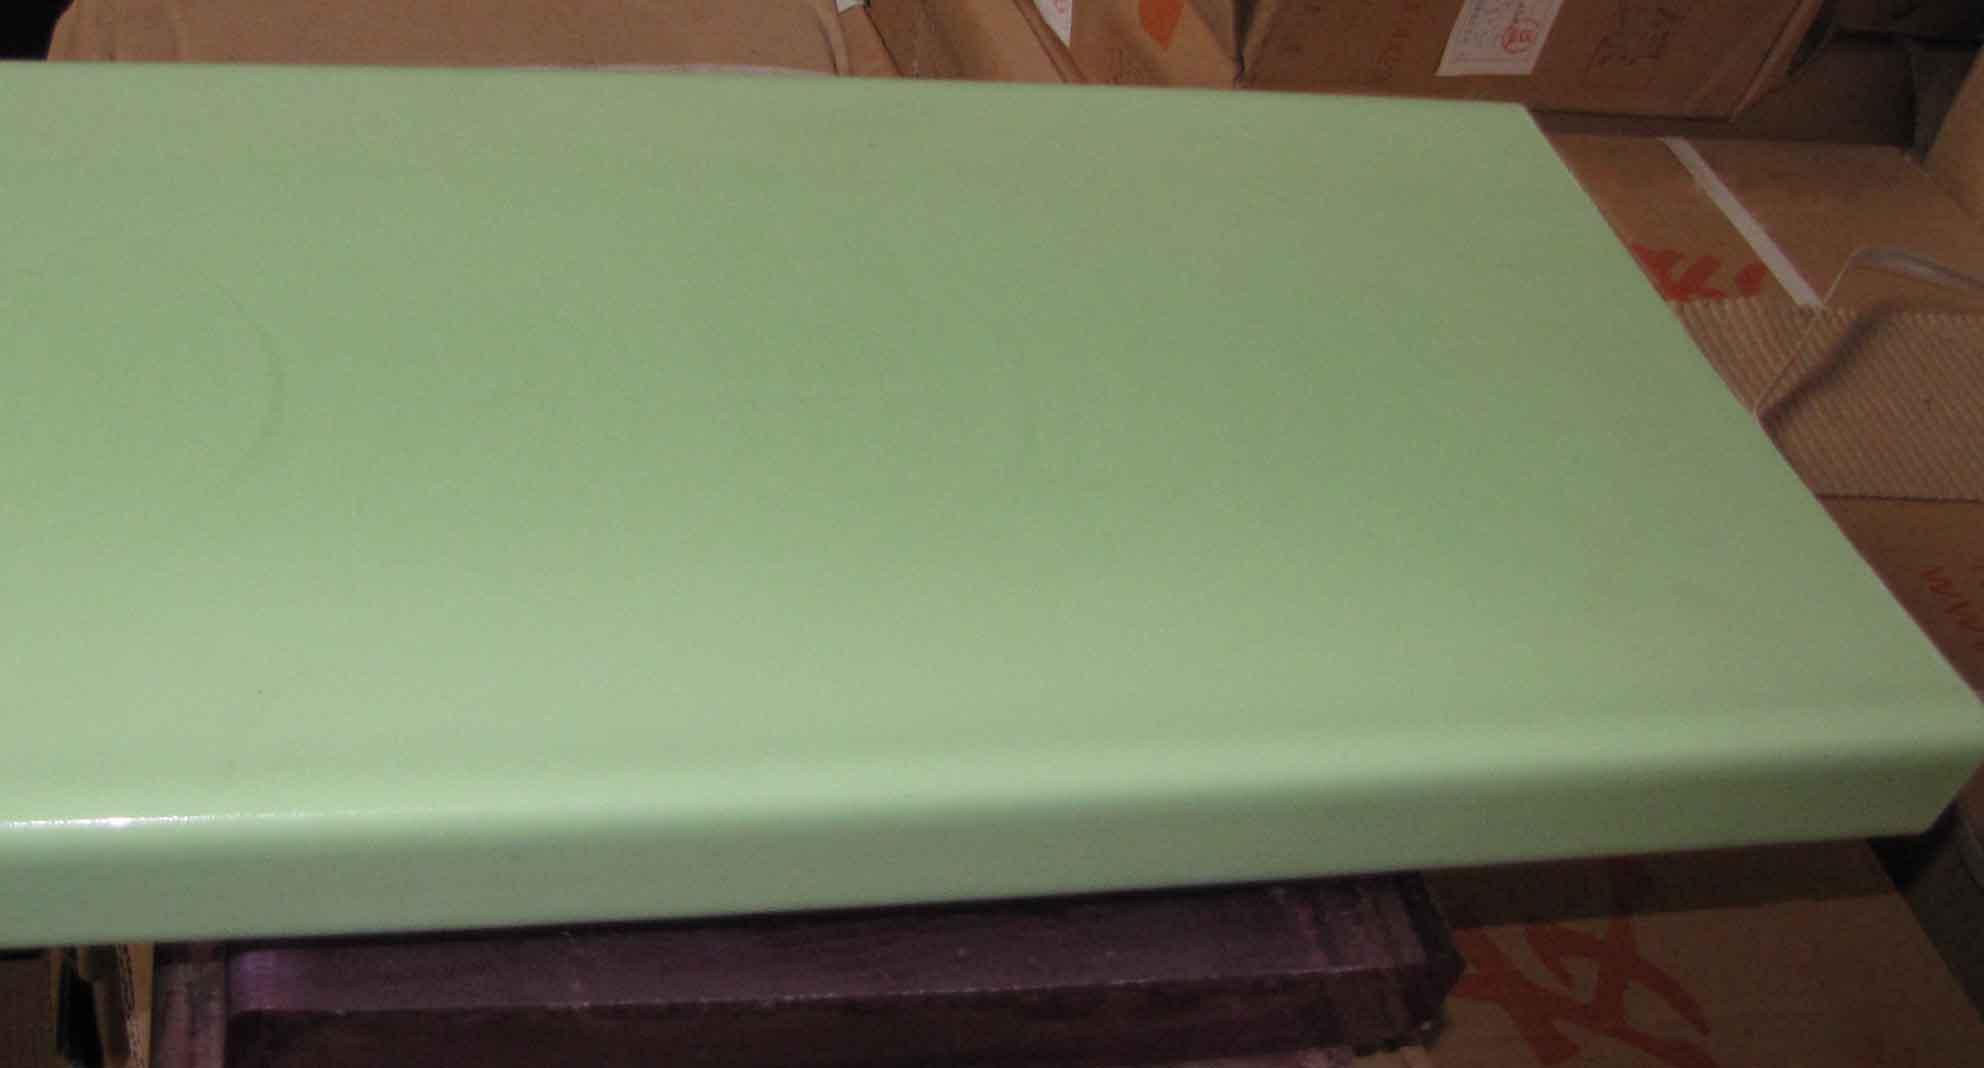 pea-green-glass-slab